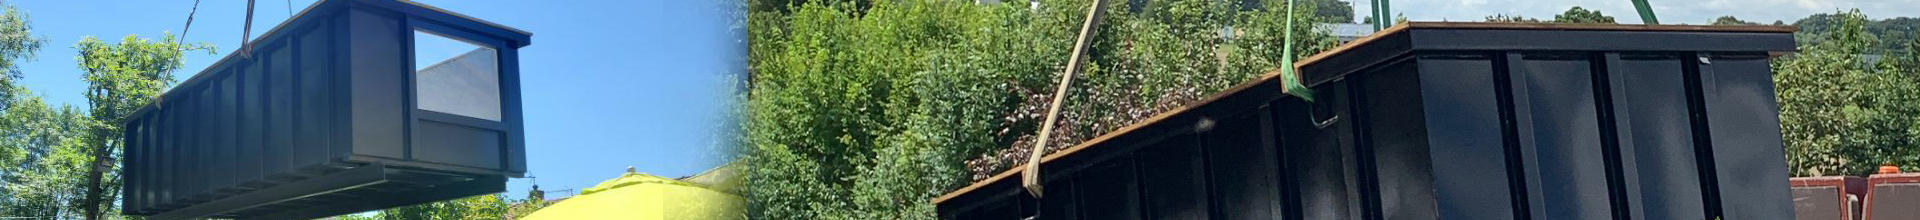 Luxembourg conception container piscine sur mesure Rumelange